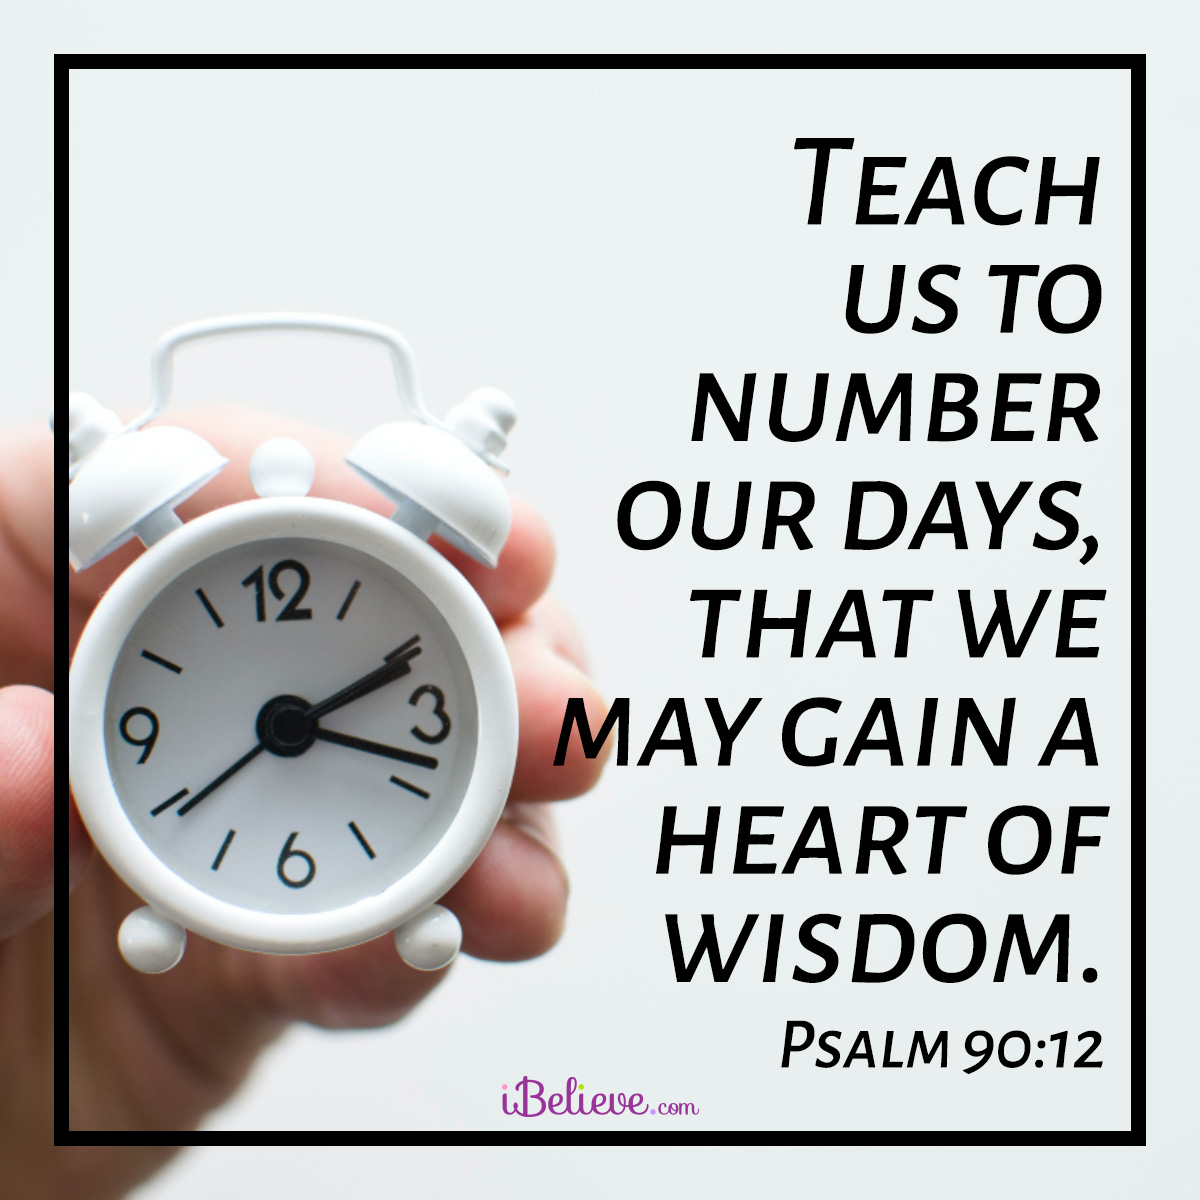 Psalm 90:12, inspirational image